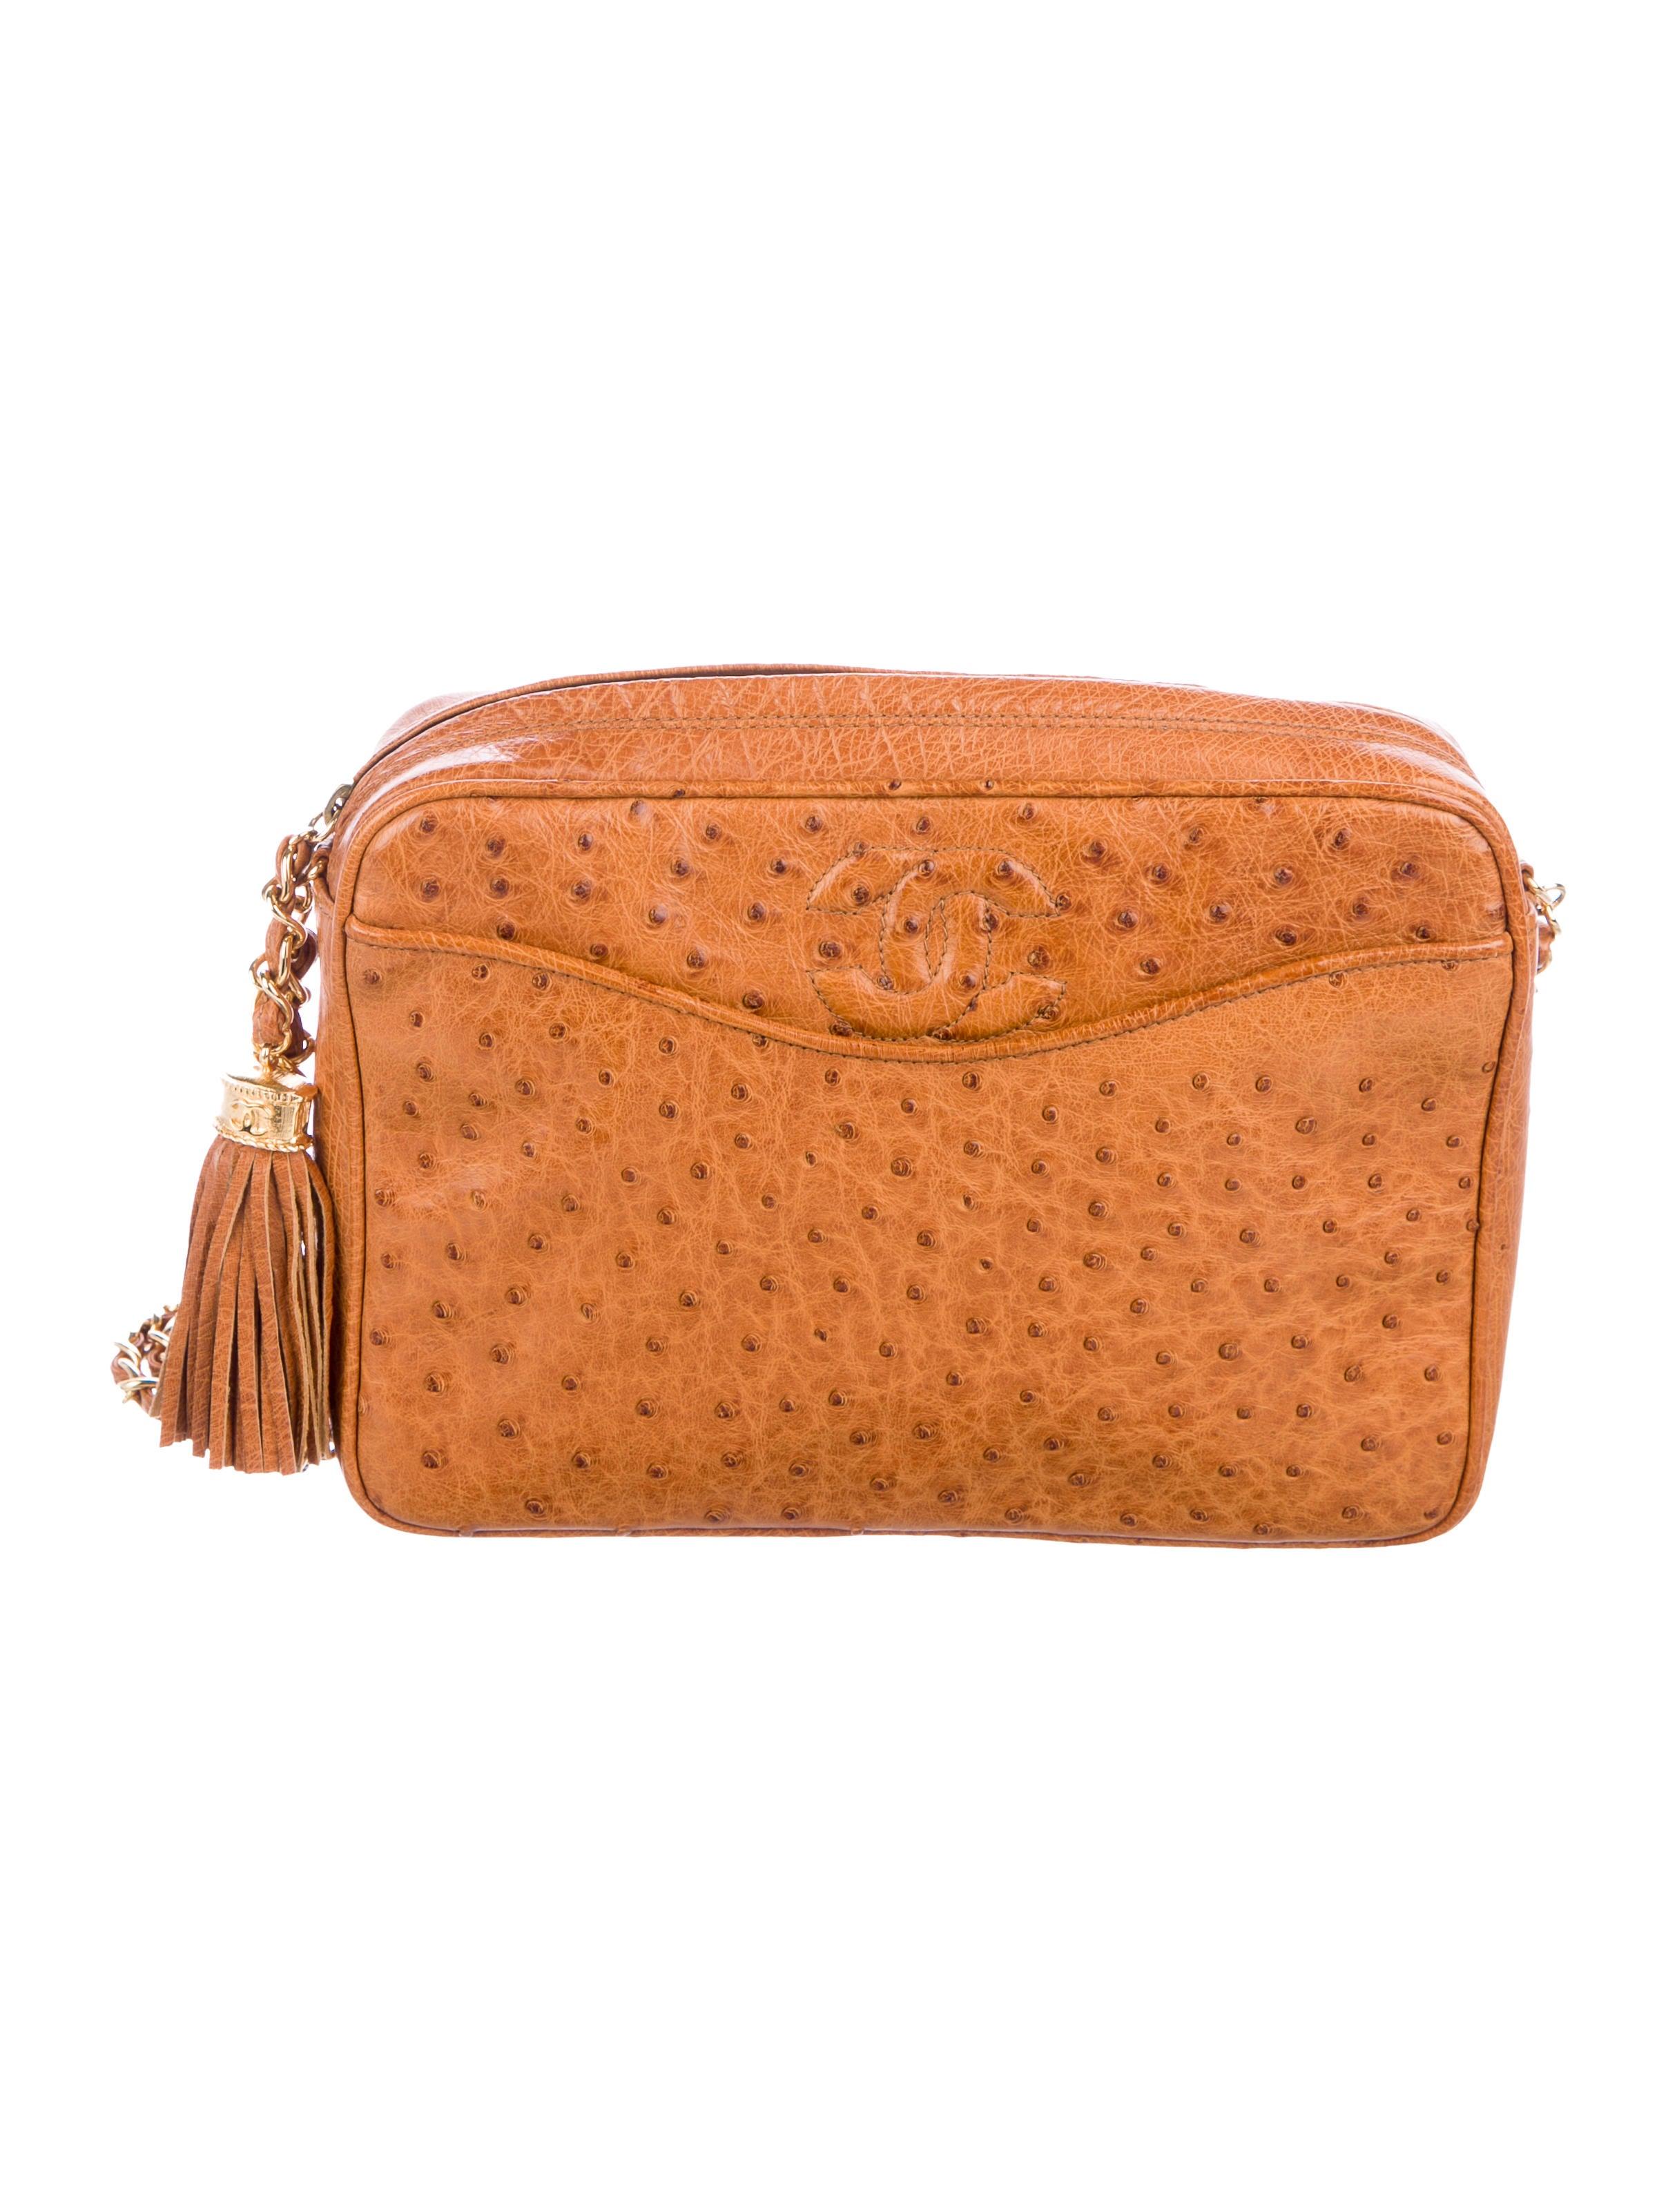 8fbc1e576c1f Chanel Vintage Ostrich Camera bag - Handbags - CHA255966   The RealReal